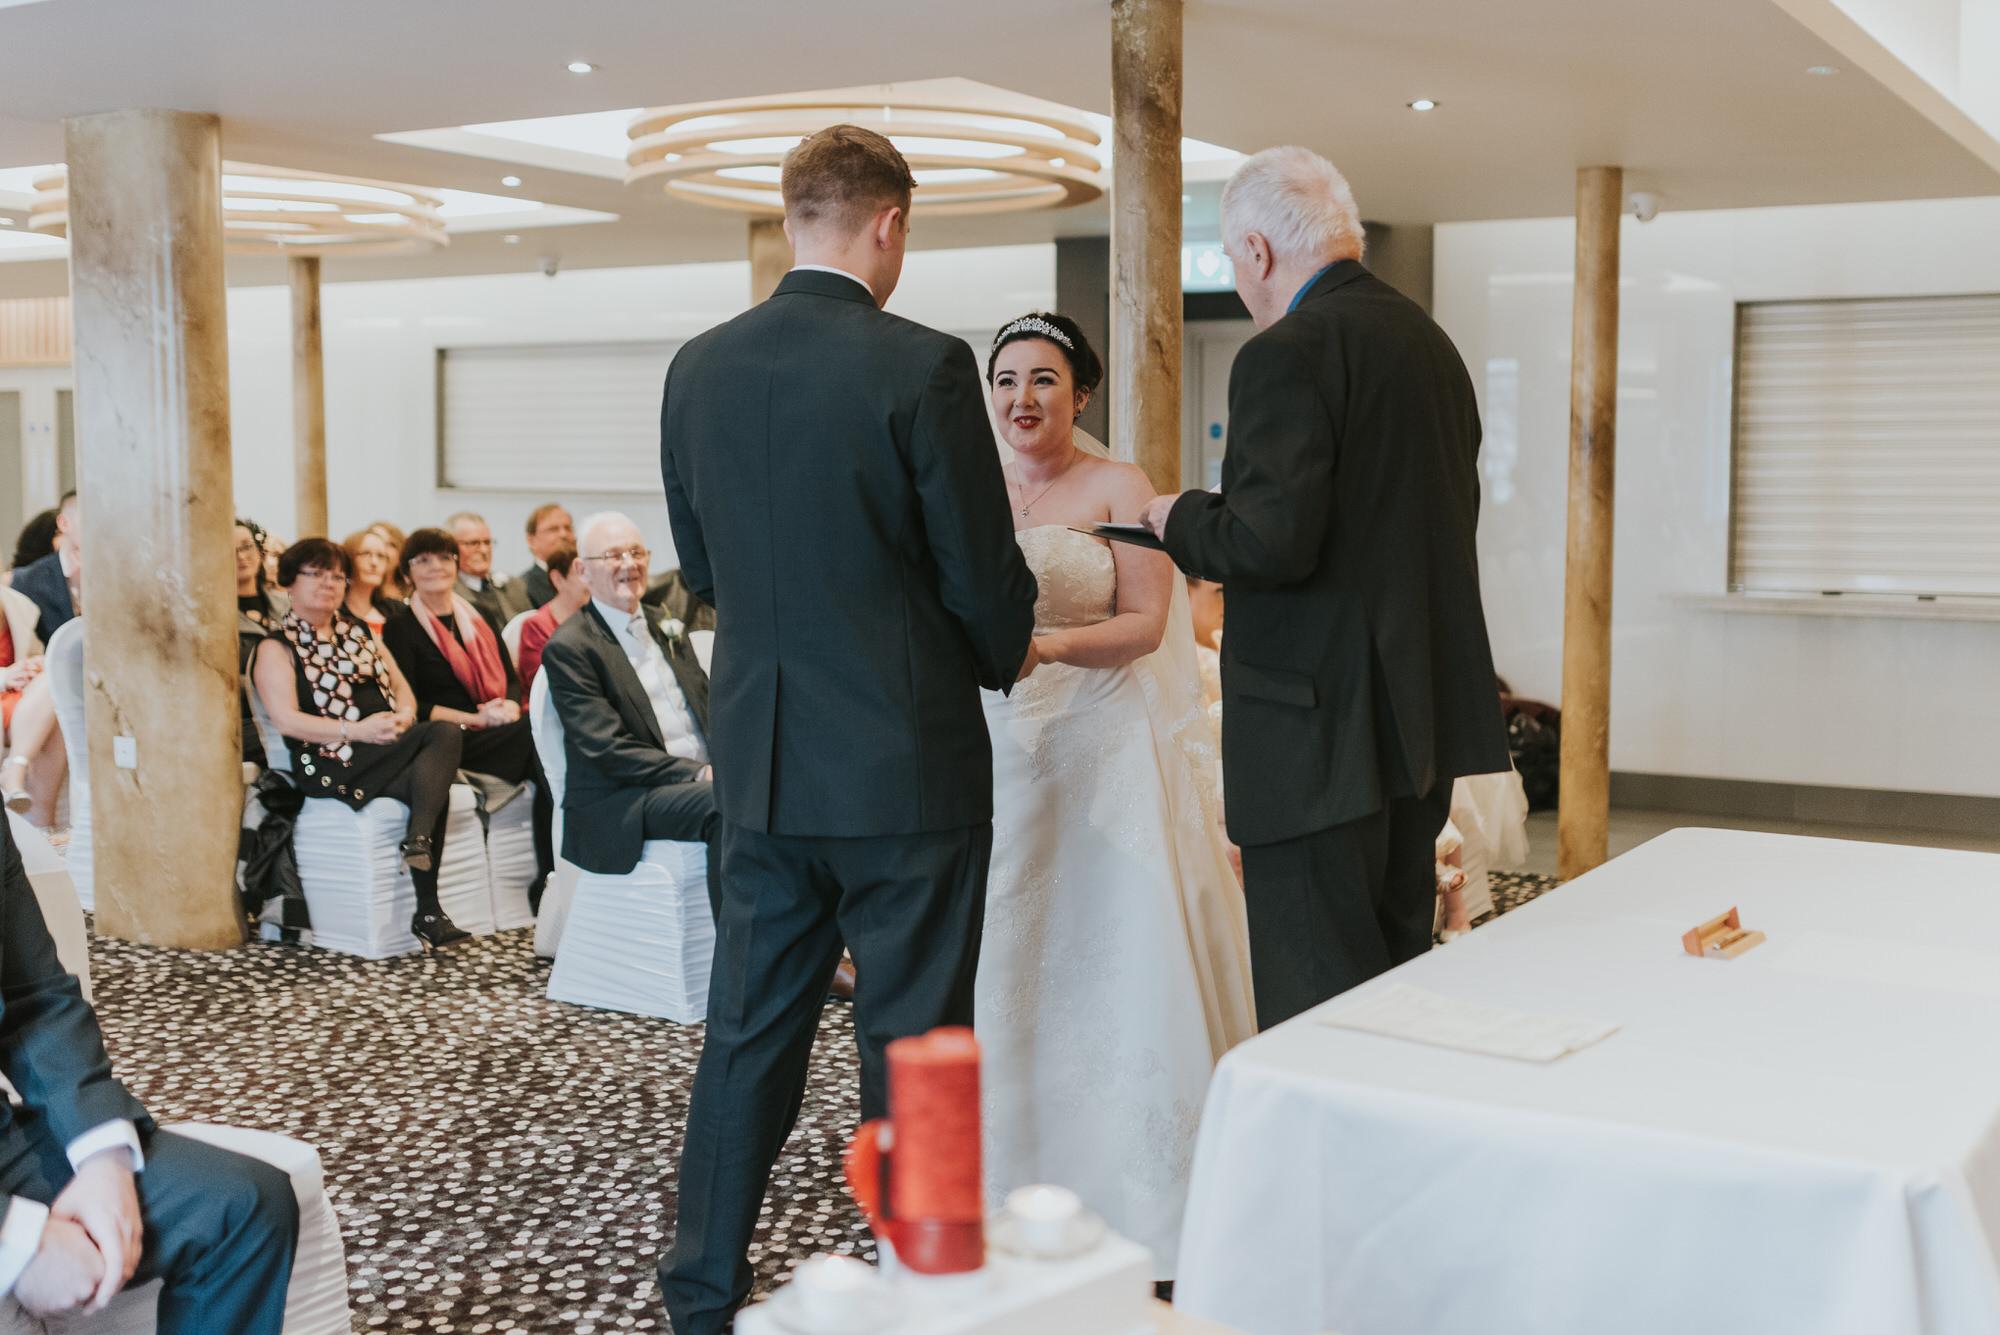 ten square hotel wedding ceremony belfast groom bride together